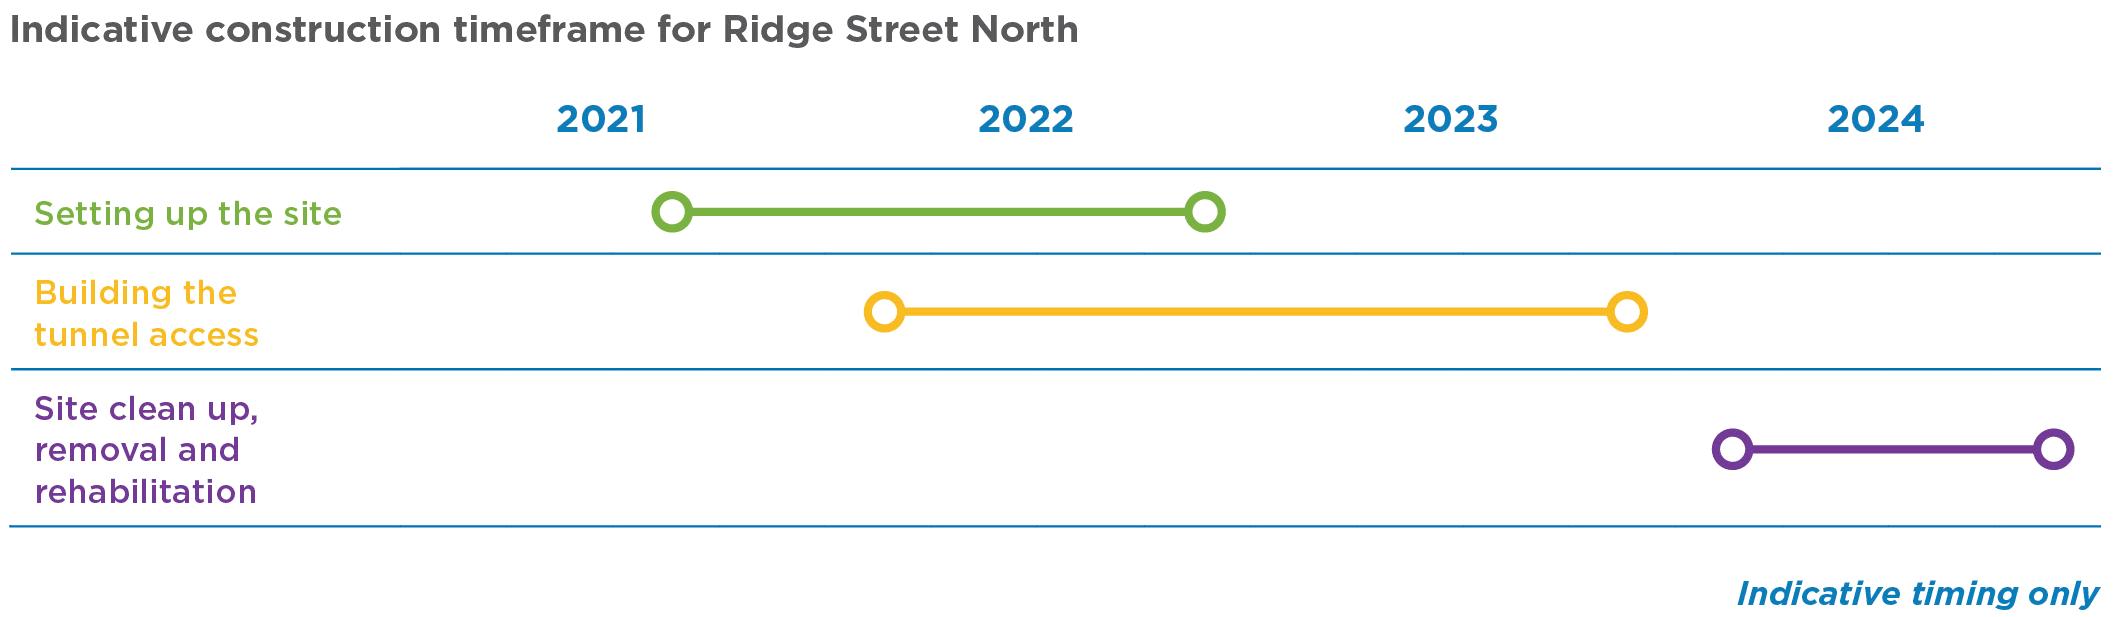 Ridge Street North construction site timeline